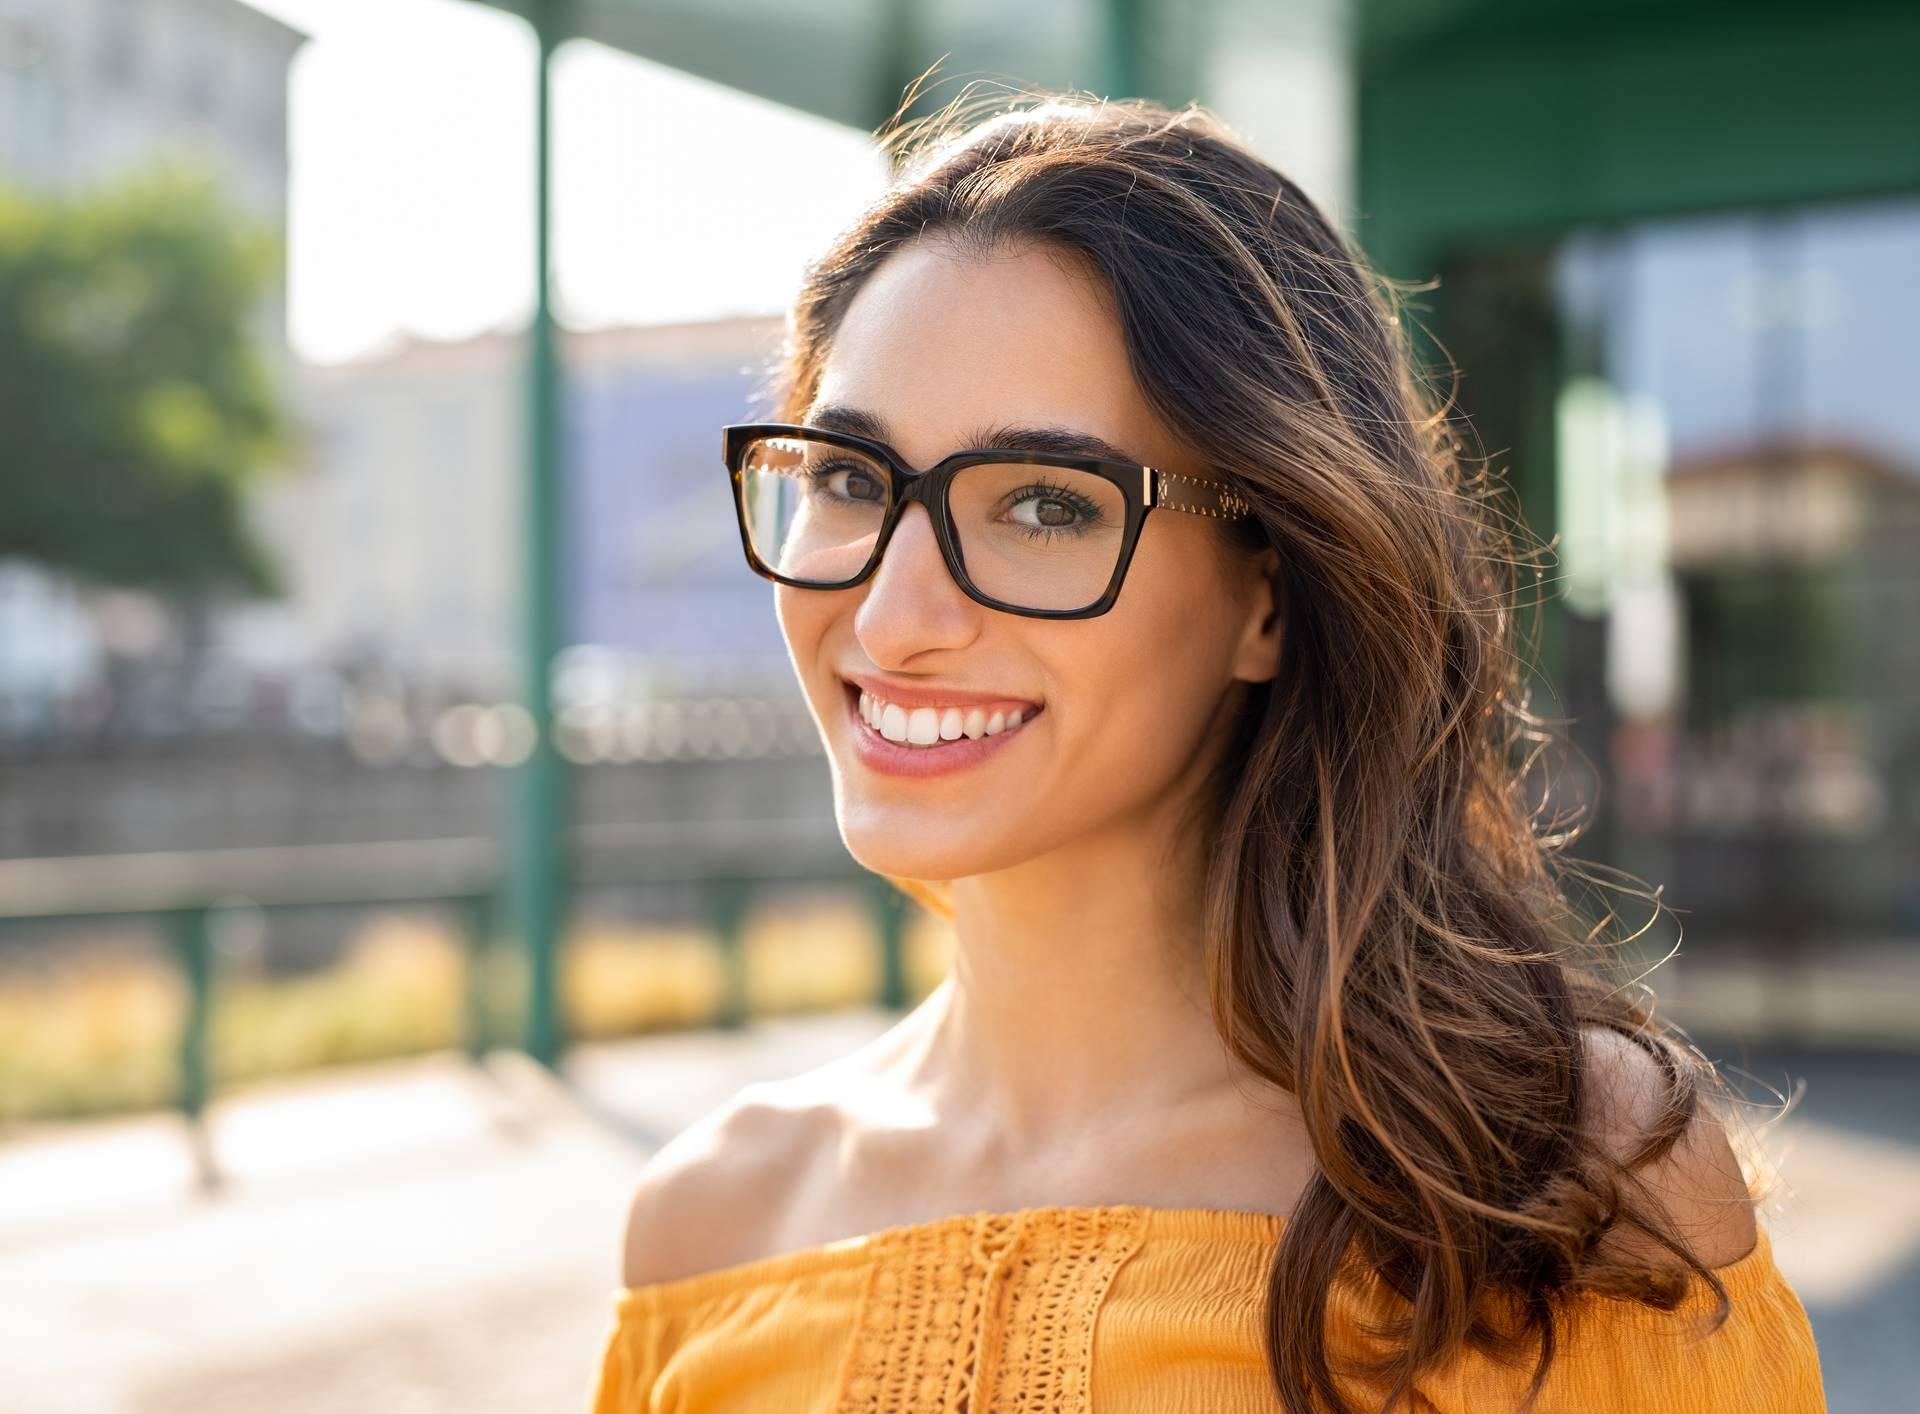 Smiling woman wearing eyeglasses outdoor